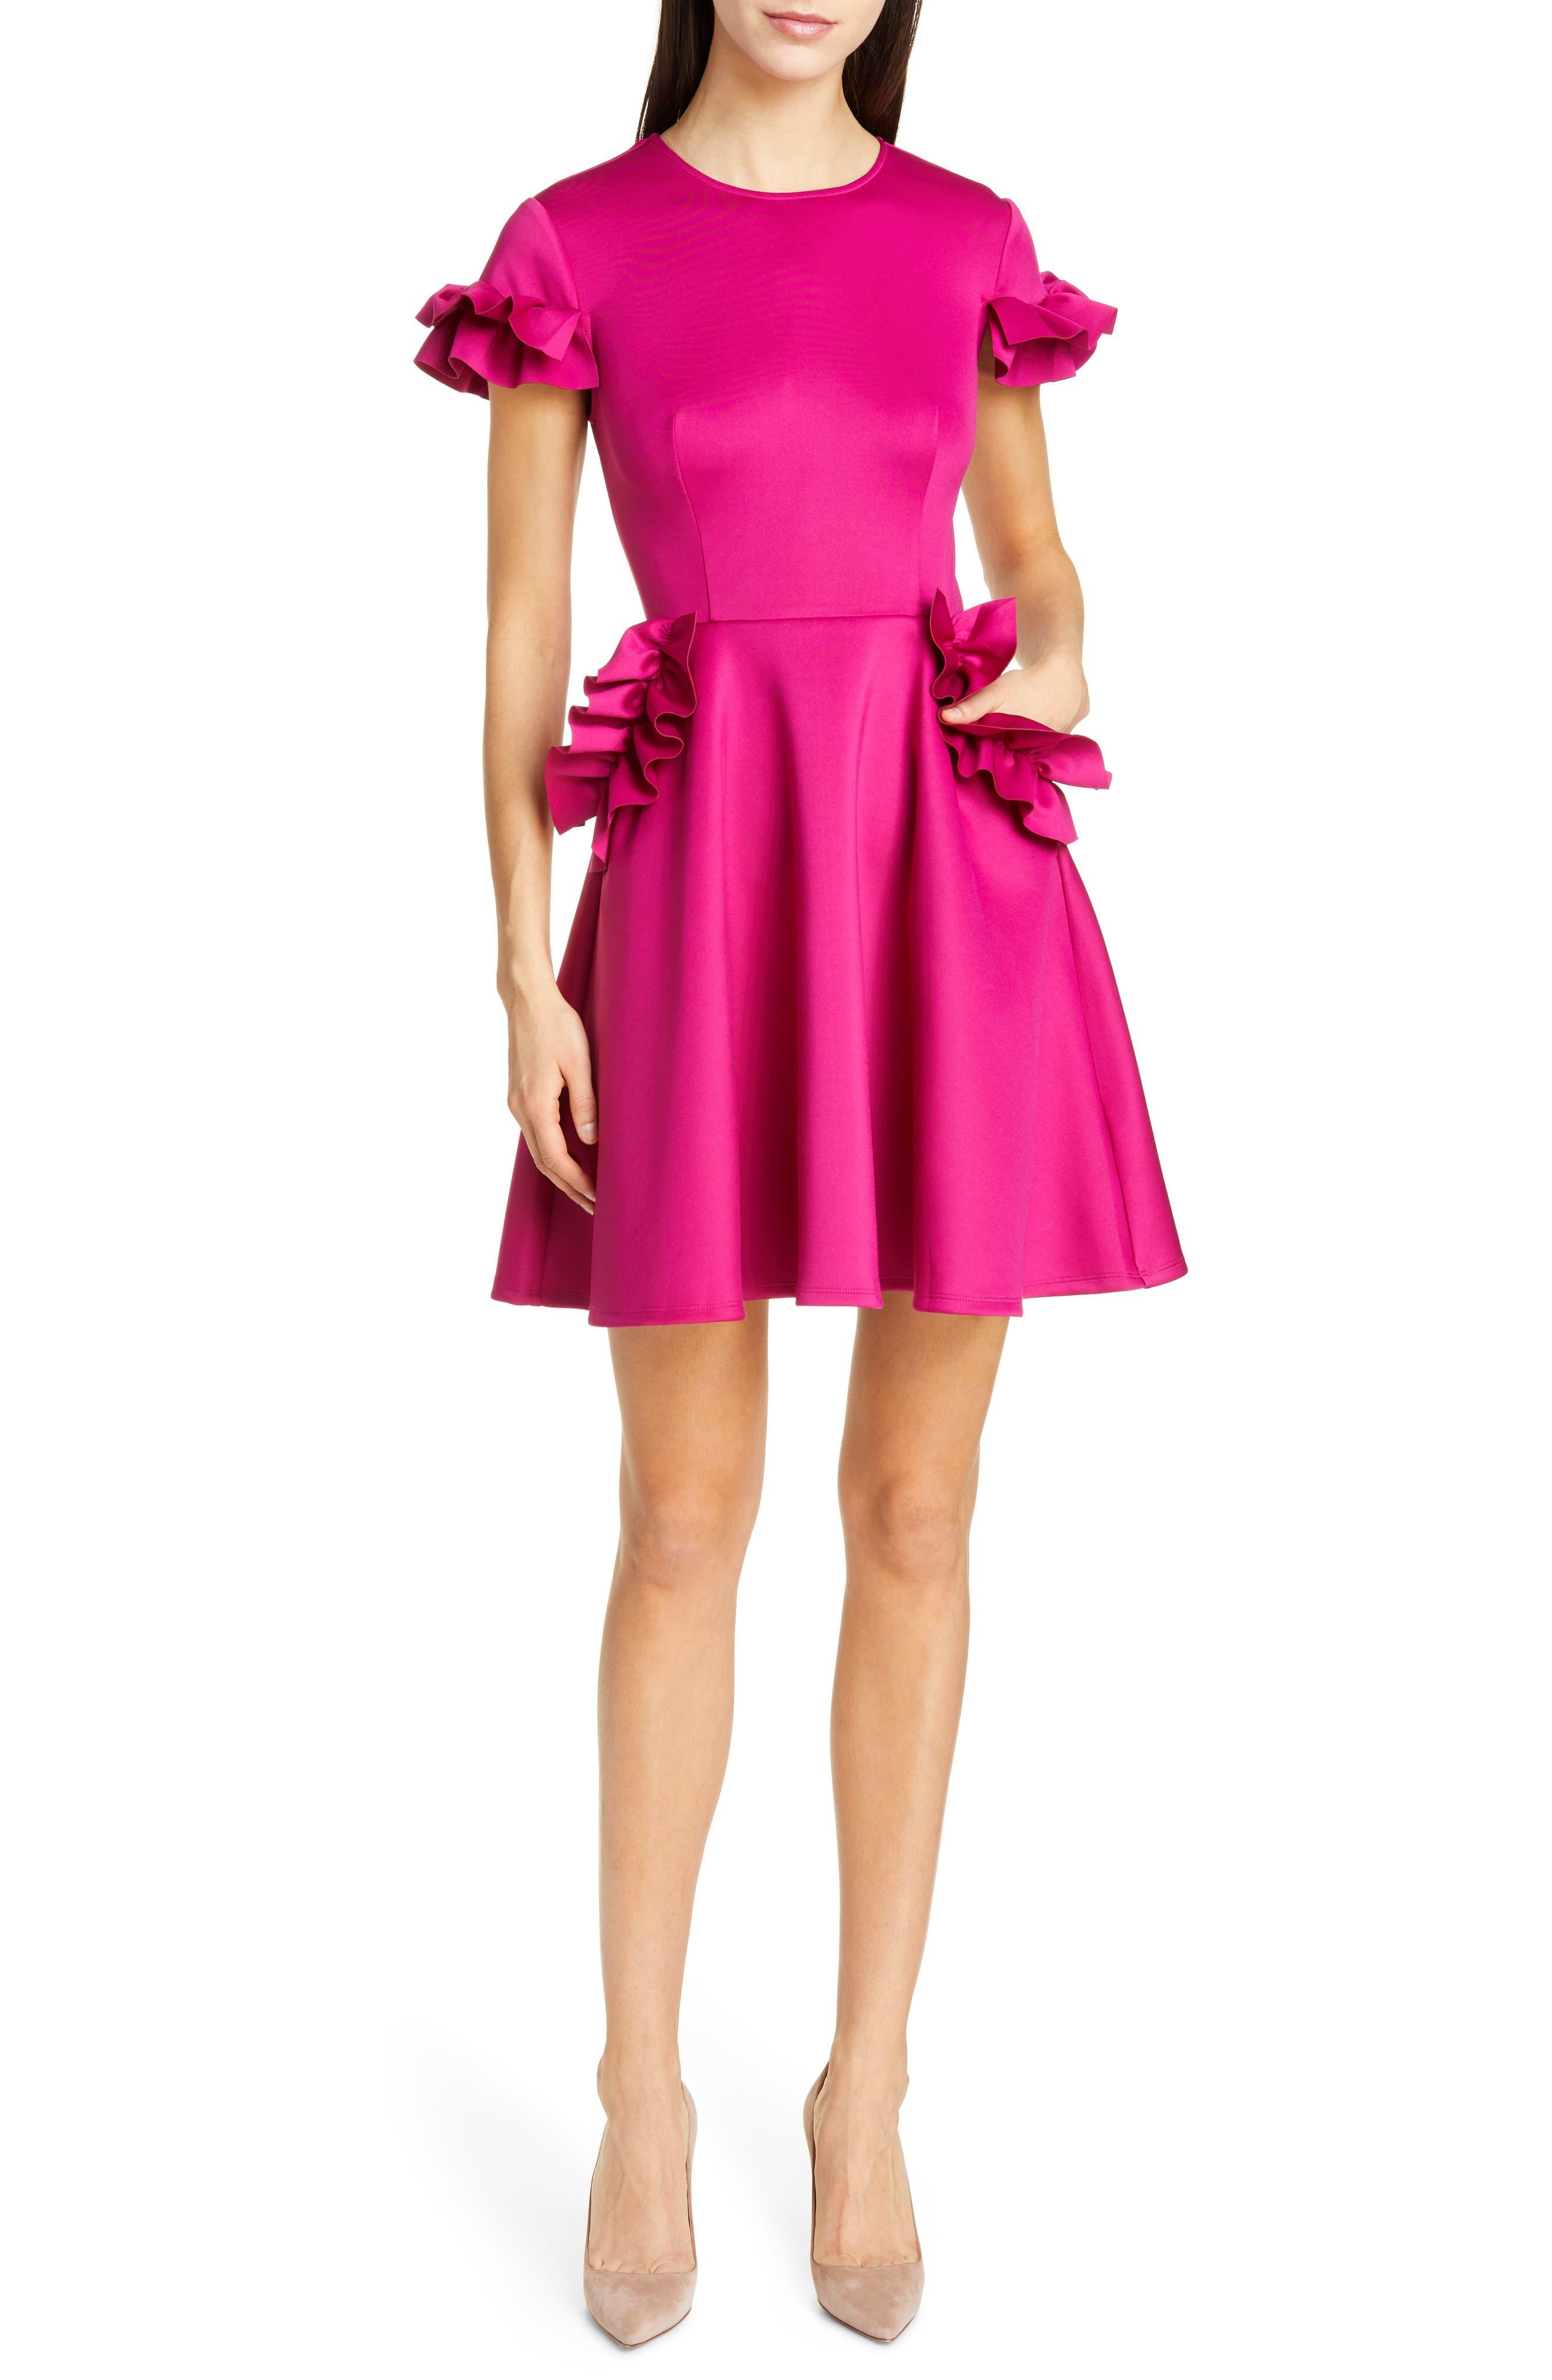 Ted Baker London Luuciee Ruffle Skater Dress, Pink